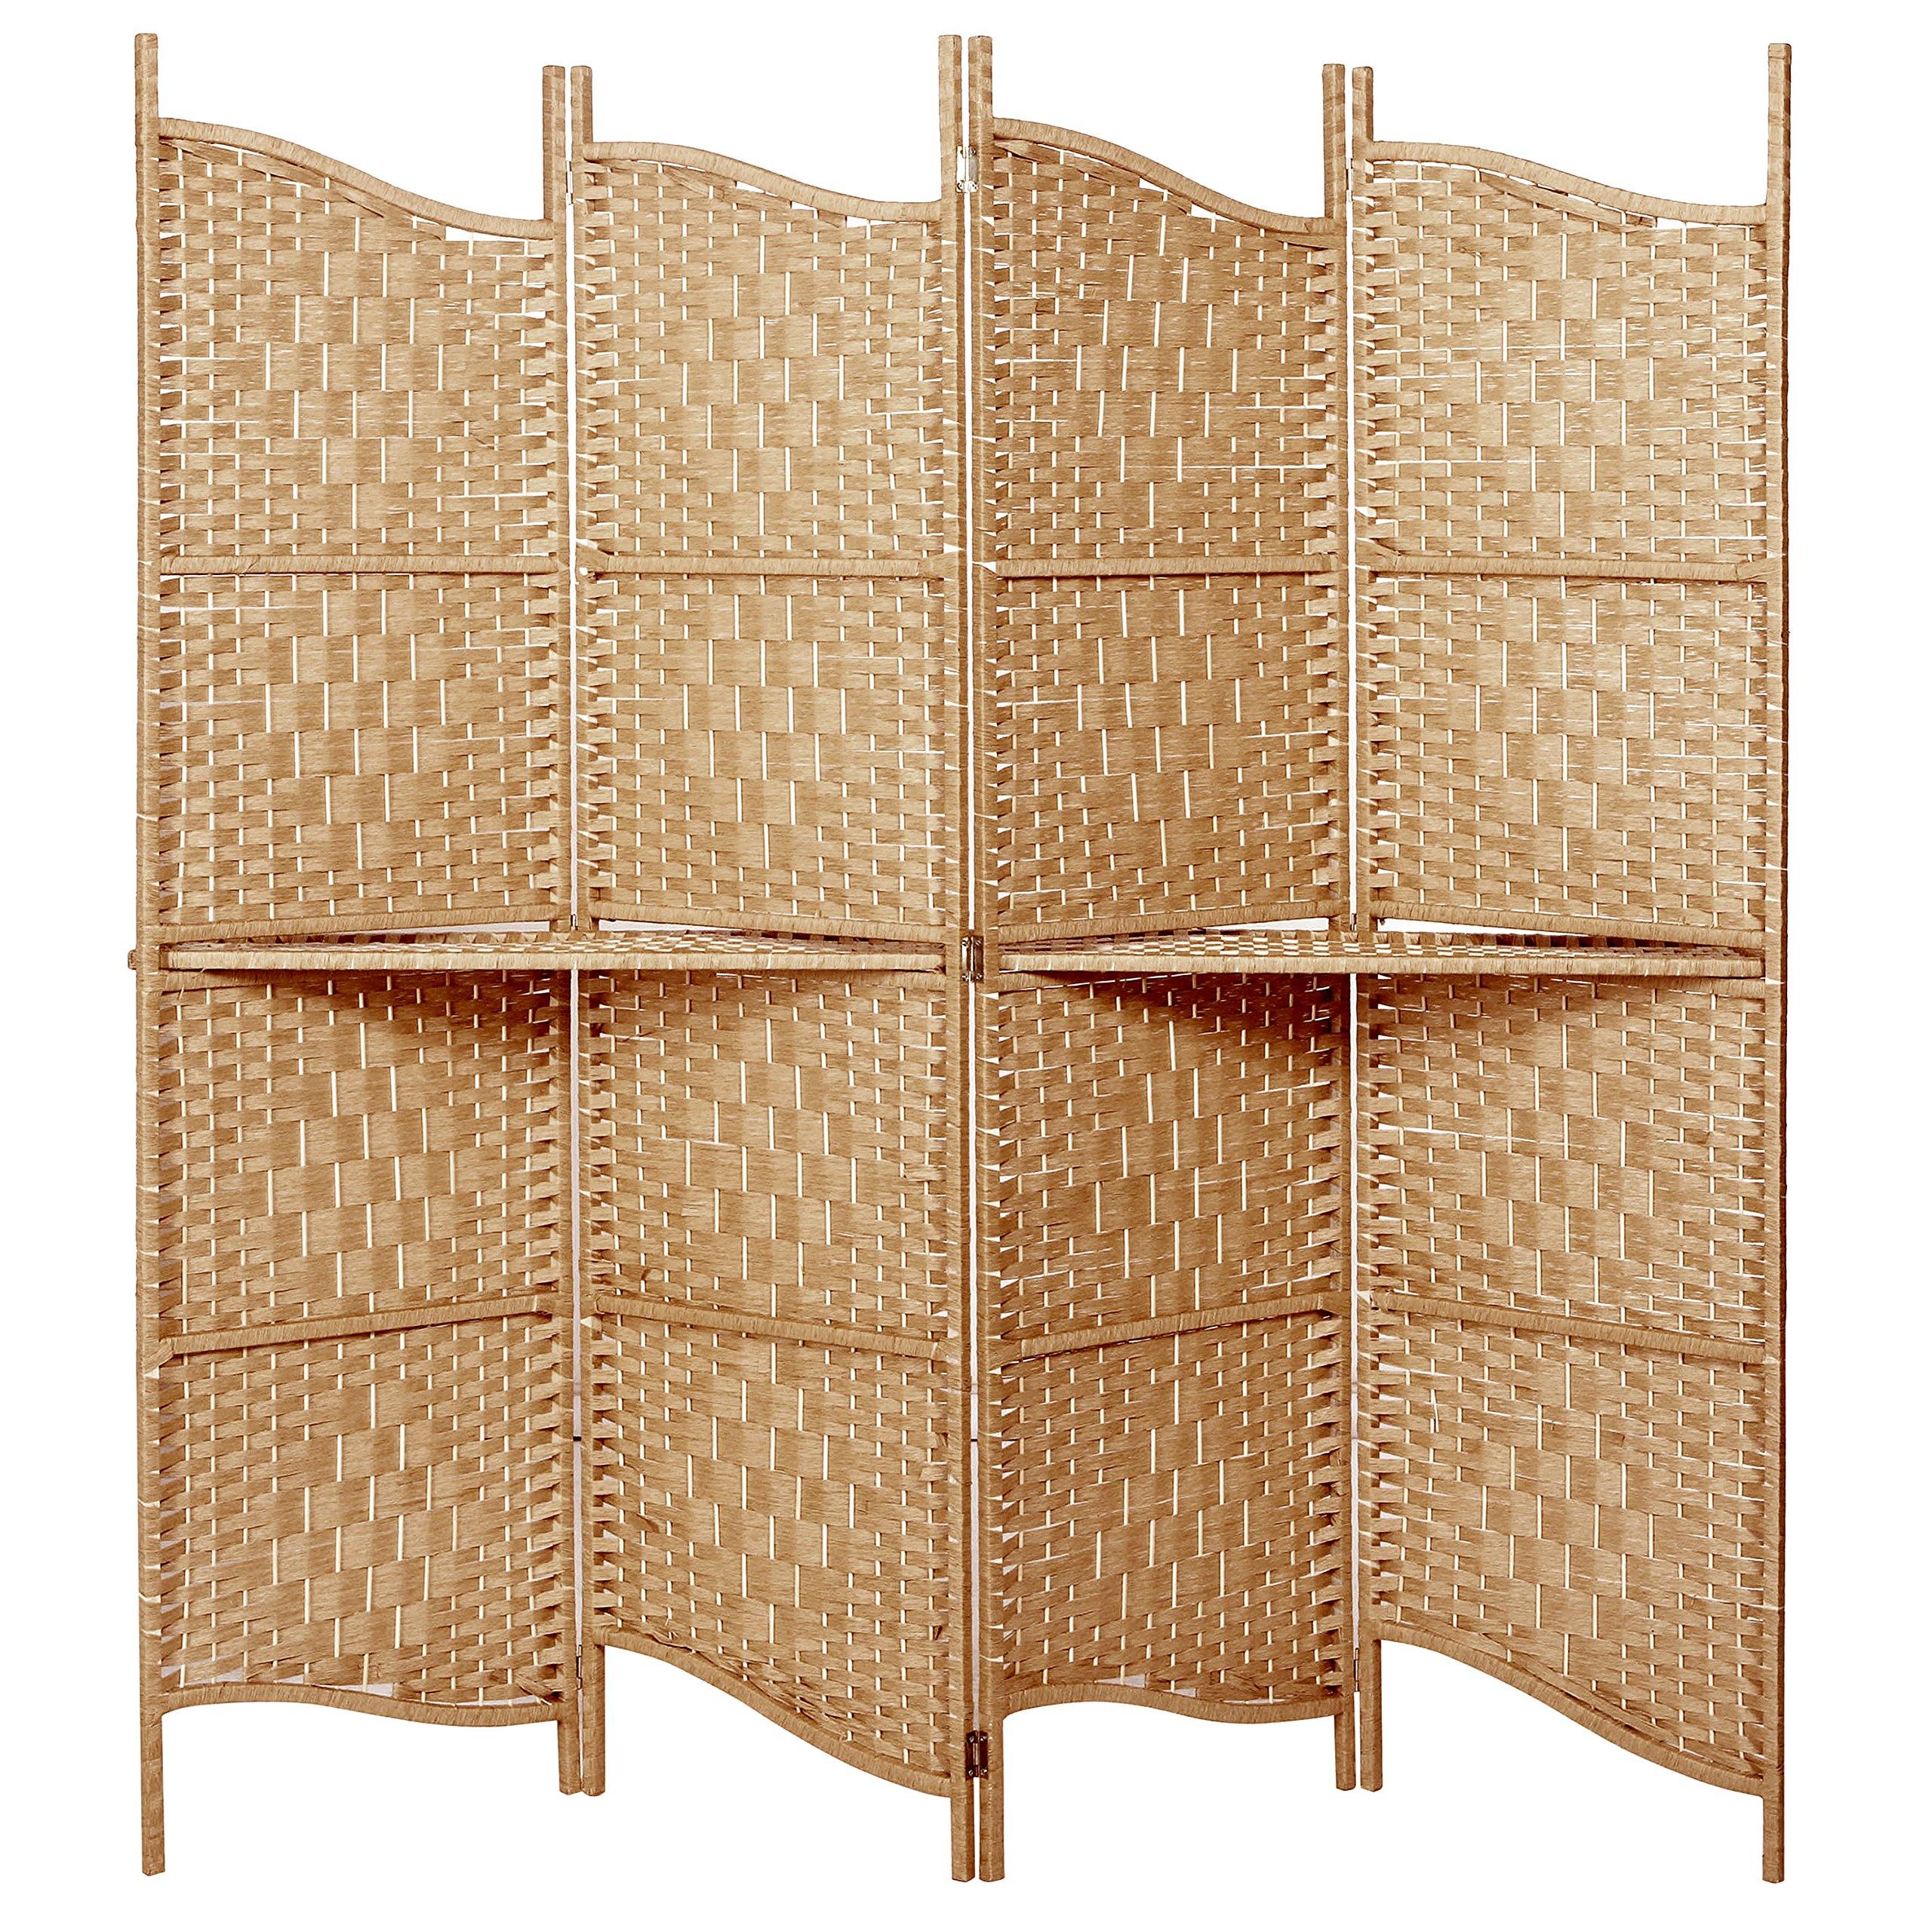 Freestanding Brown Wood Woven Paper Rattan Room Divider 4 Panel